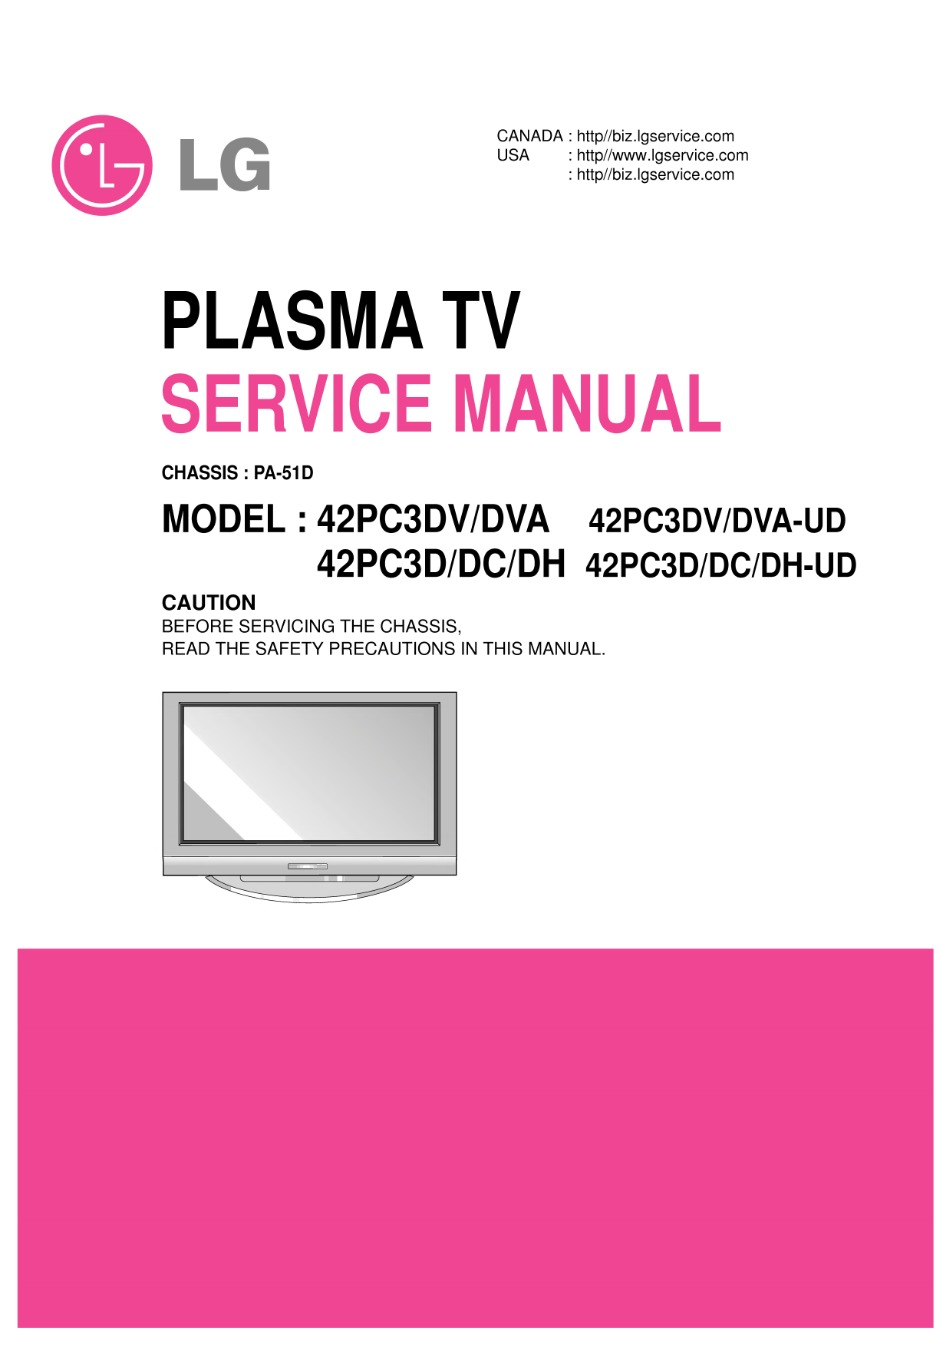 lg 42pc3dv ud 42pc3dva ud 42pc3d ud 42pc3dc ud 42pc3dh ud rh servlib com LG Plasma Parts LG Plasma Replacement Parts